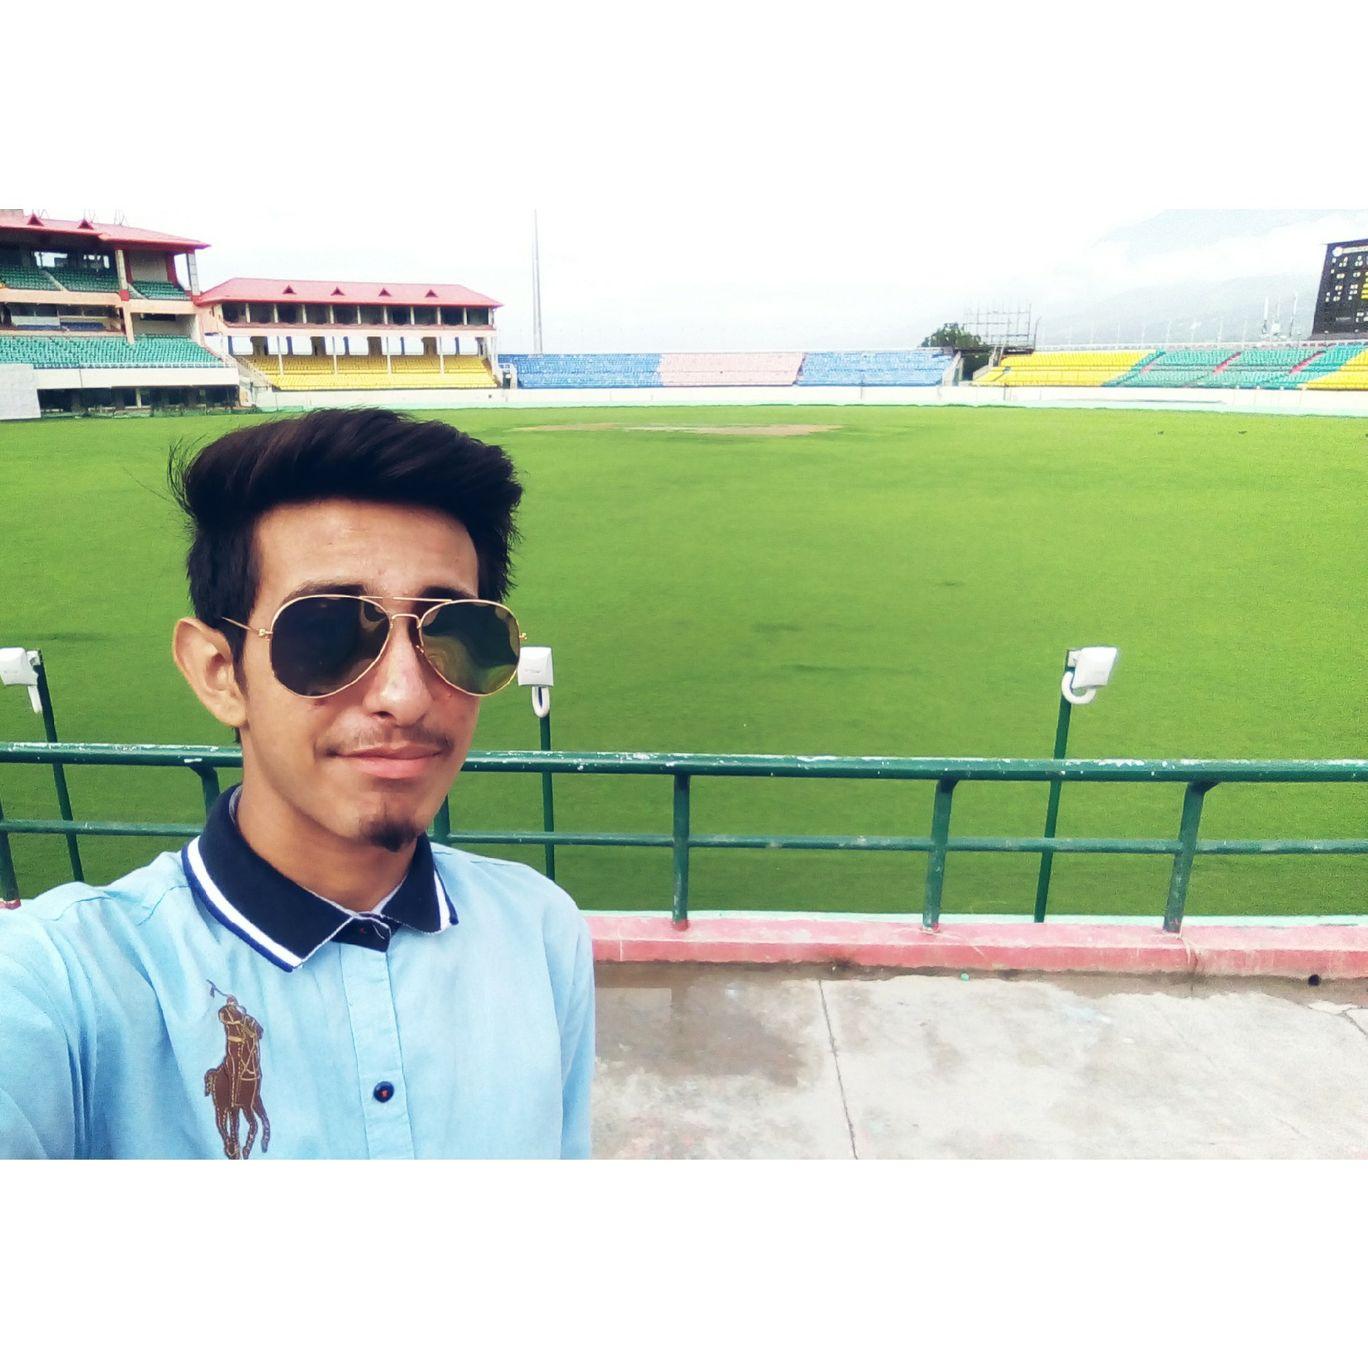 Photo of Himachal Pradesh Cricket Association Stadium Dharamshala By DeepansHu SharMa